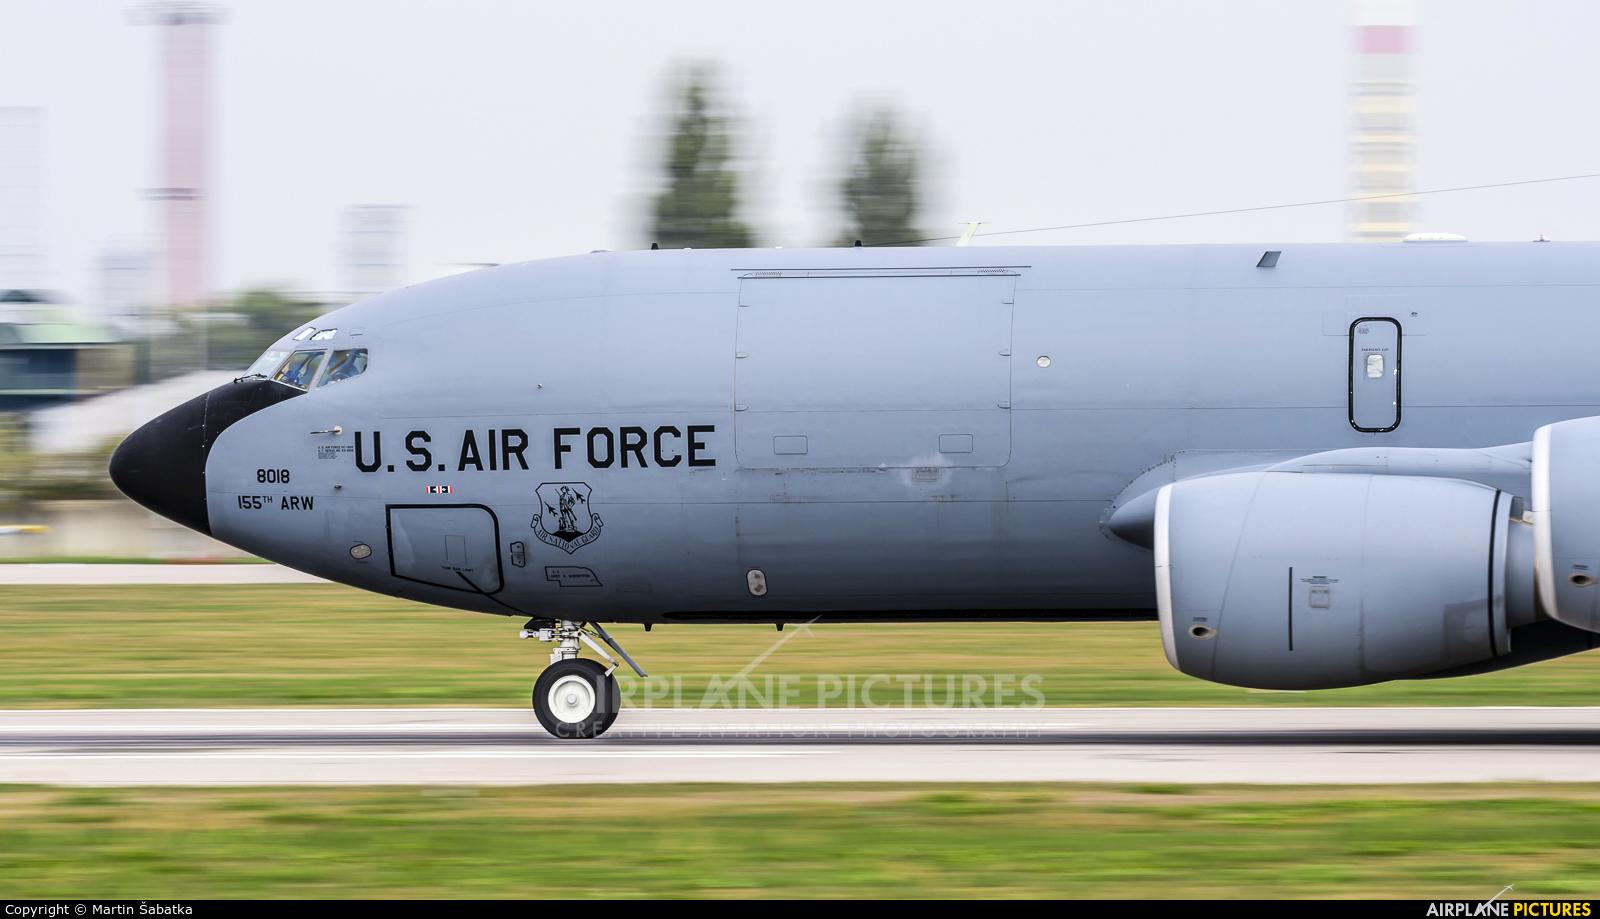 USA - Air Force 63-8018 aircraft at Pardubice